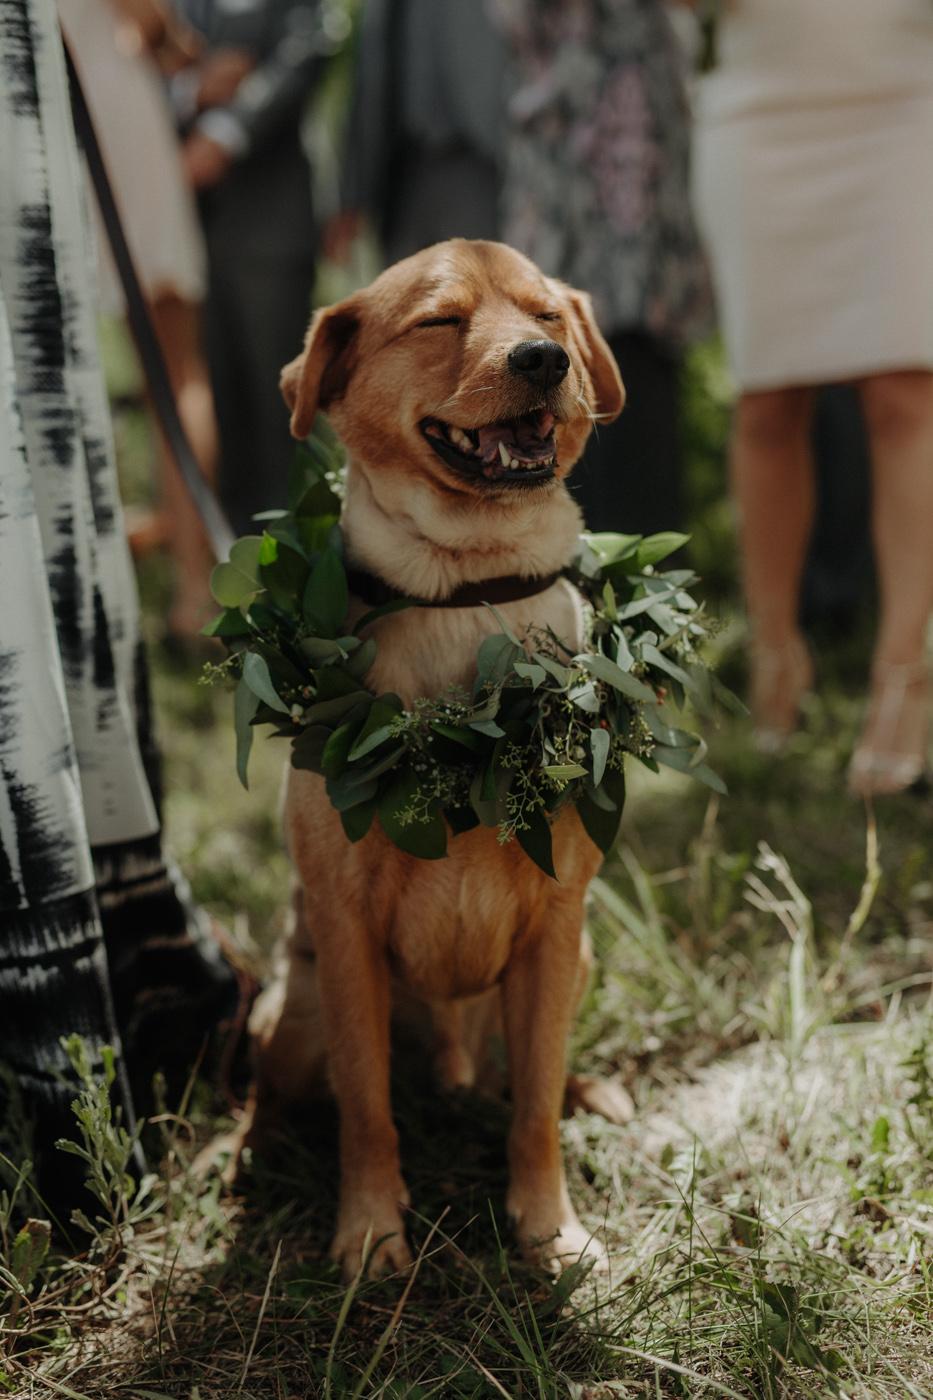 woods-walk-trail-crested-butte-colorado-wedding-13.jpg